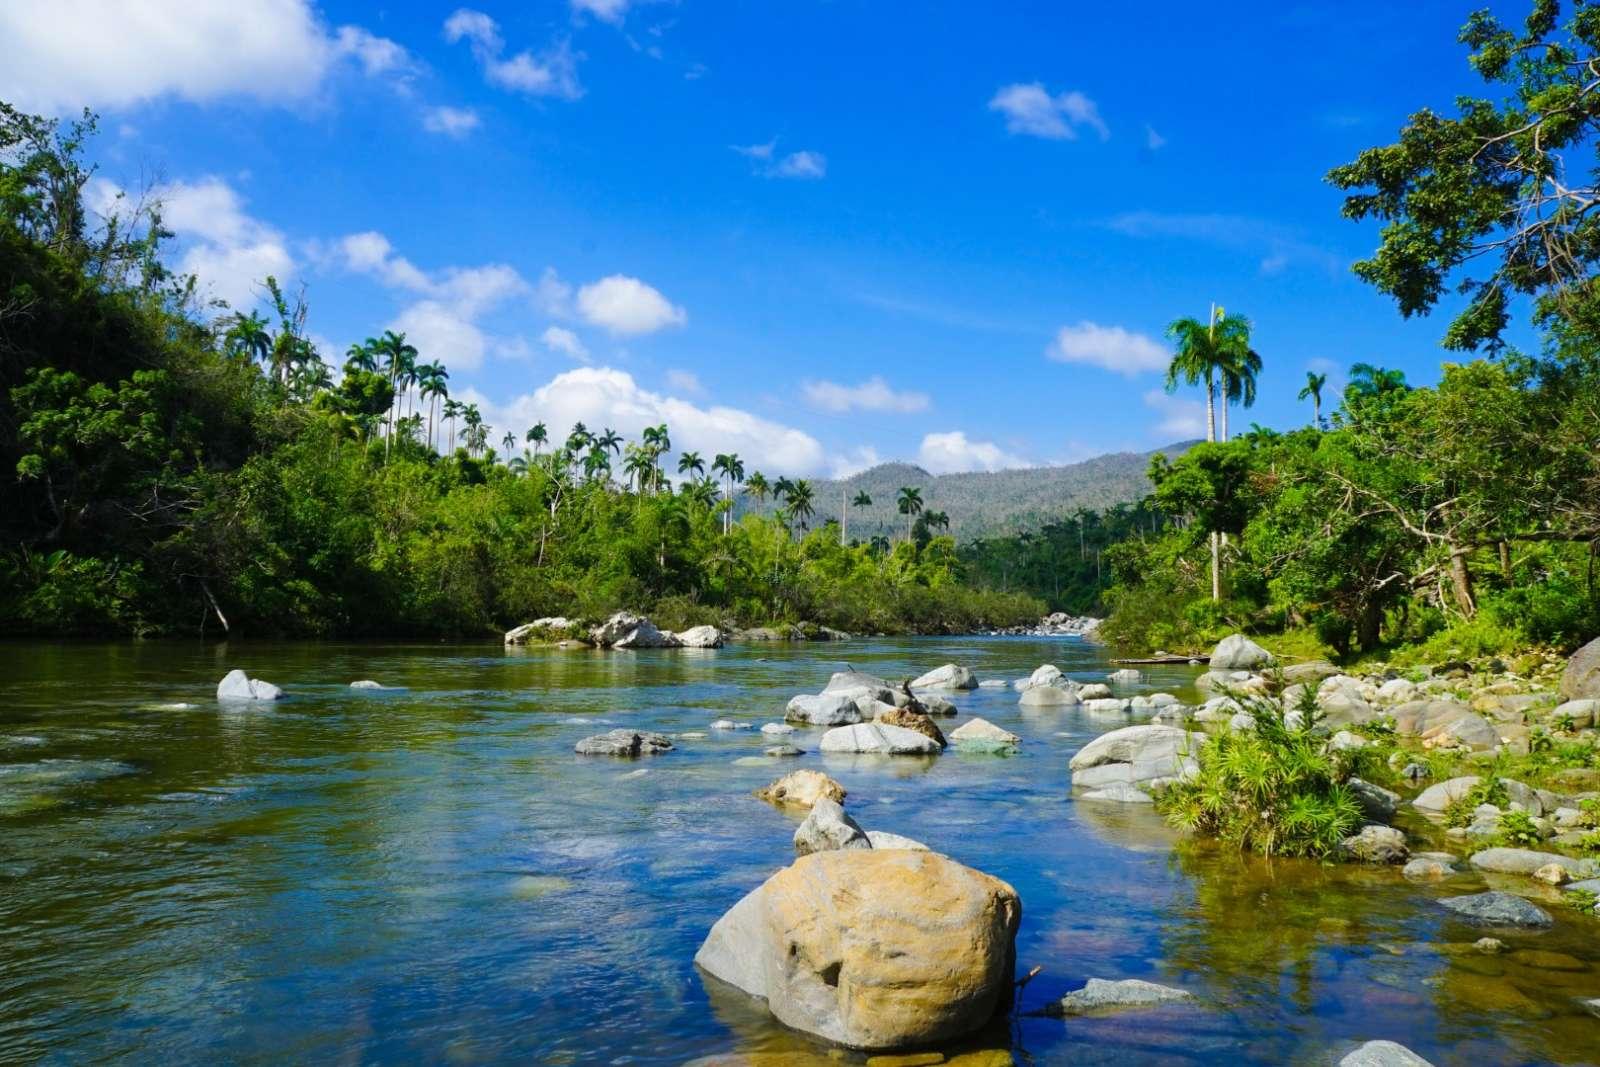 Large stones in a river near Baracoa Cuba